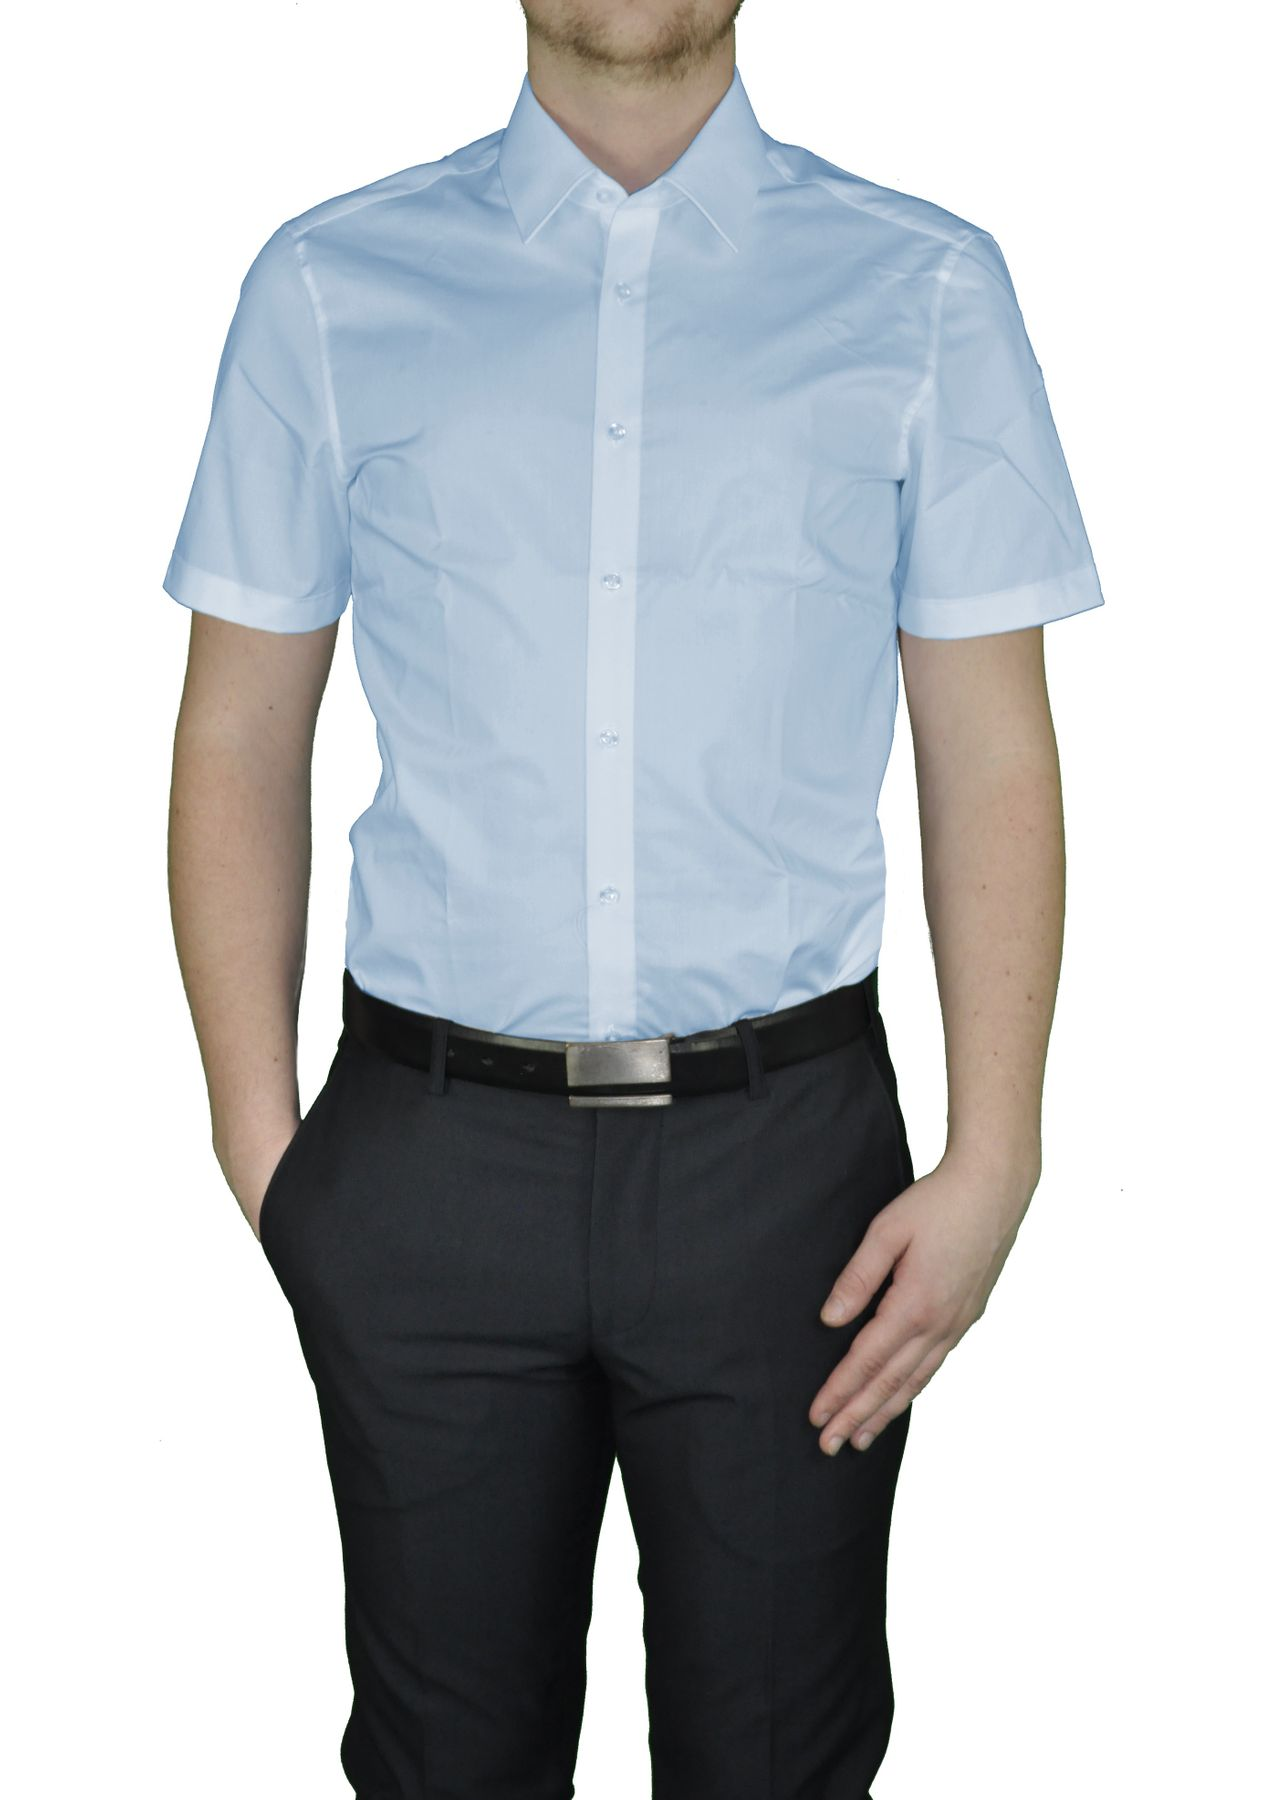 Bügelfreies Herren Slim fit kurzarm Hemd in verschiedenen Farben Marke Redmond (400930) – Bild 5